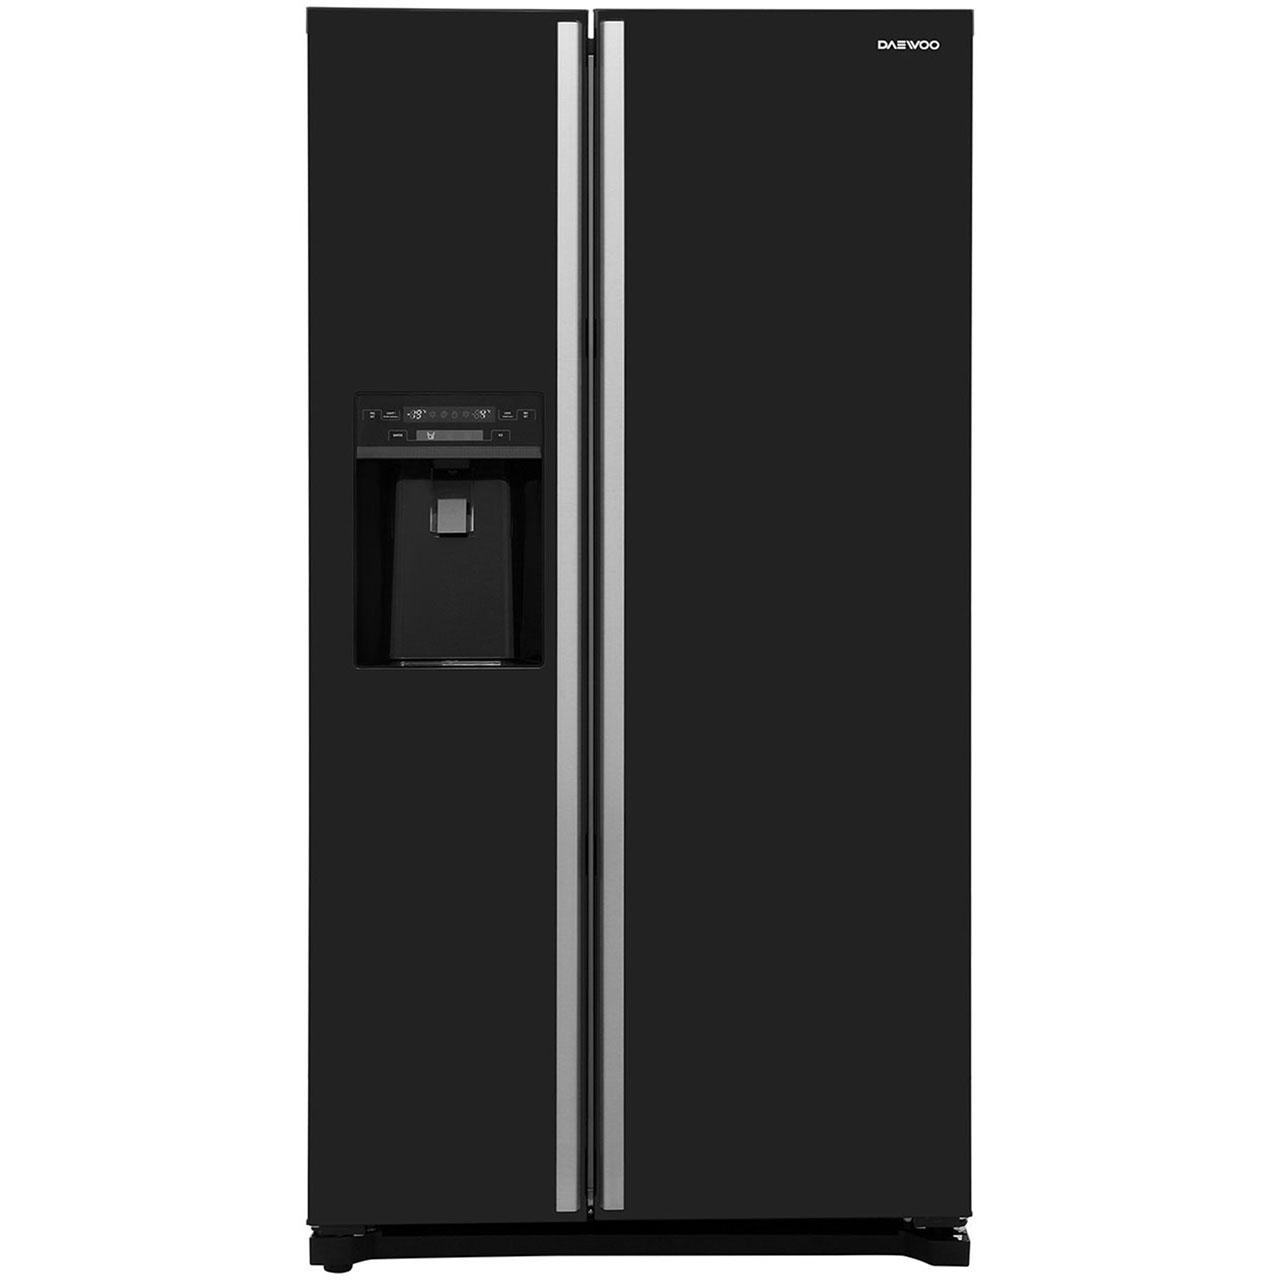 Daewoo FRAX22D3B Free Standing American Fridge Freezer in Black